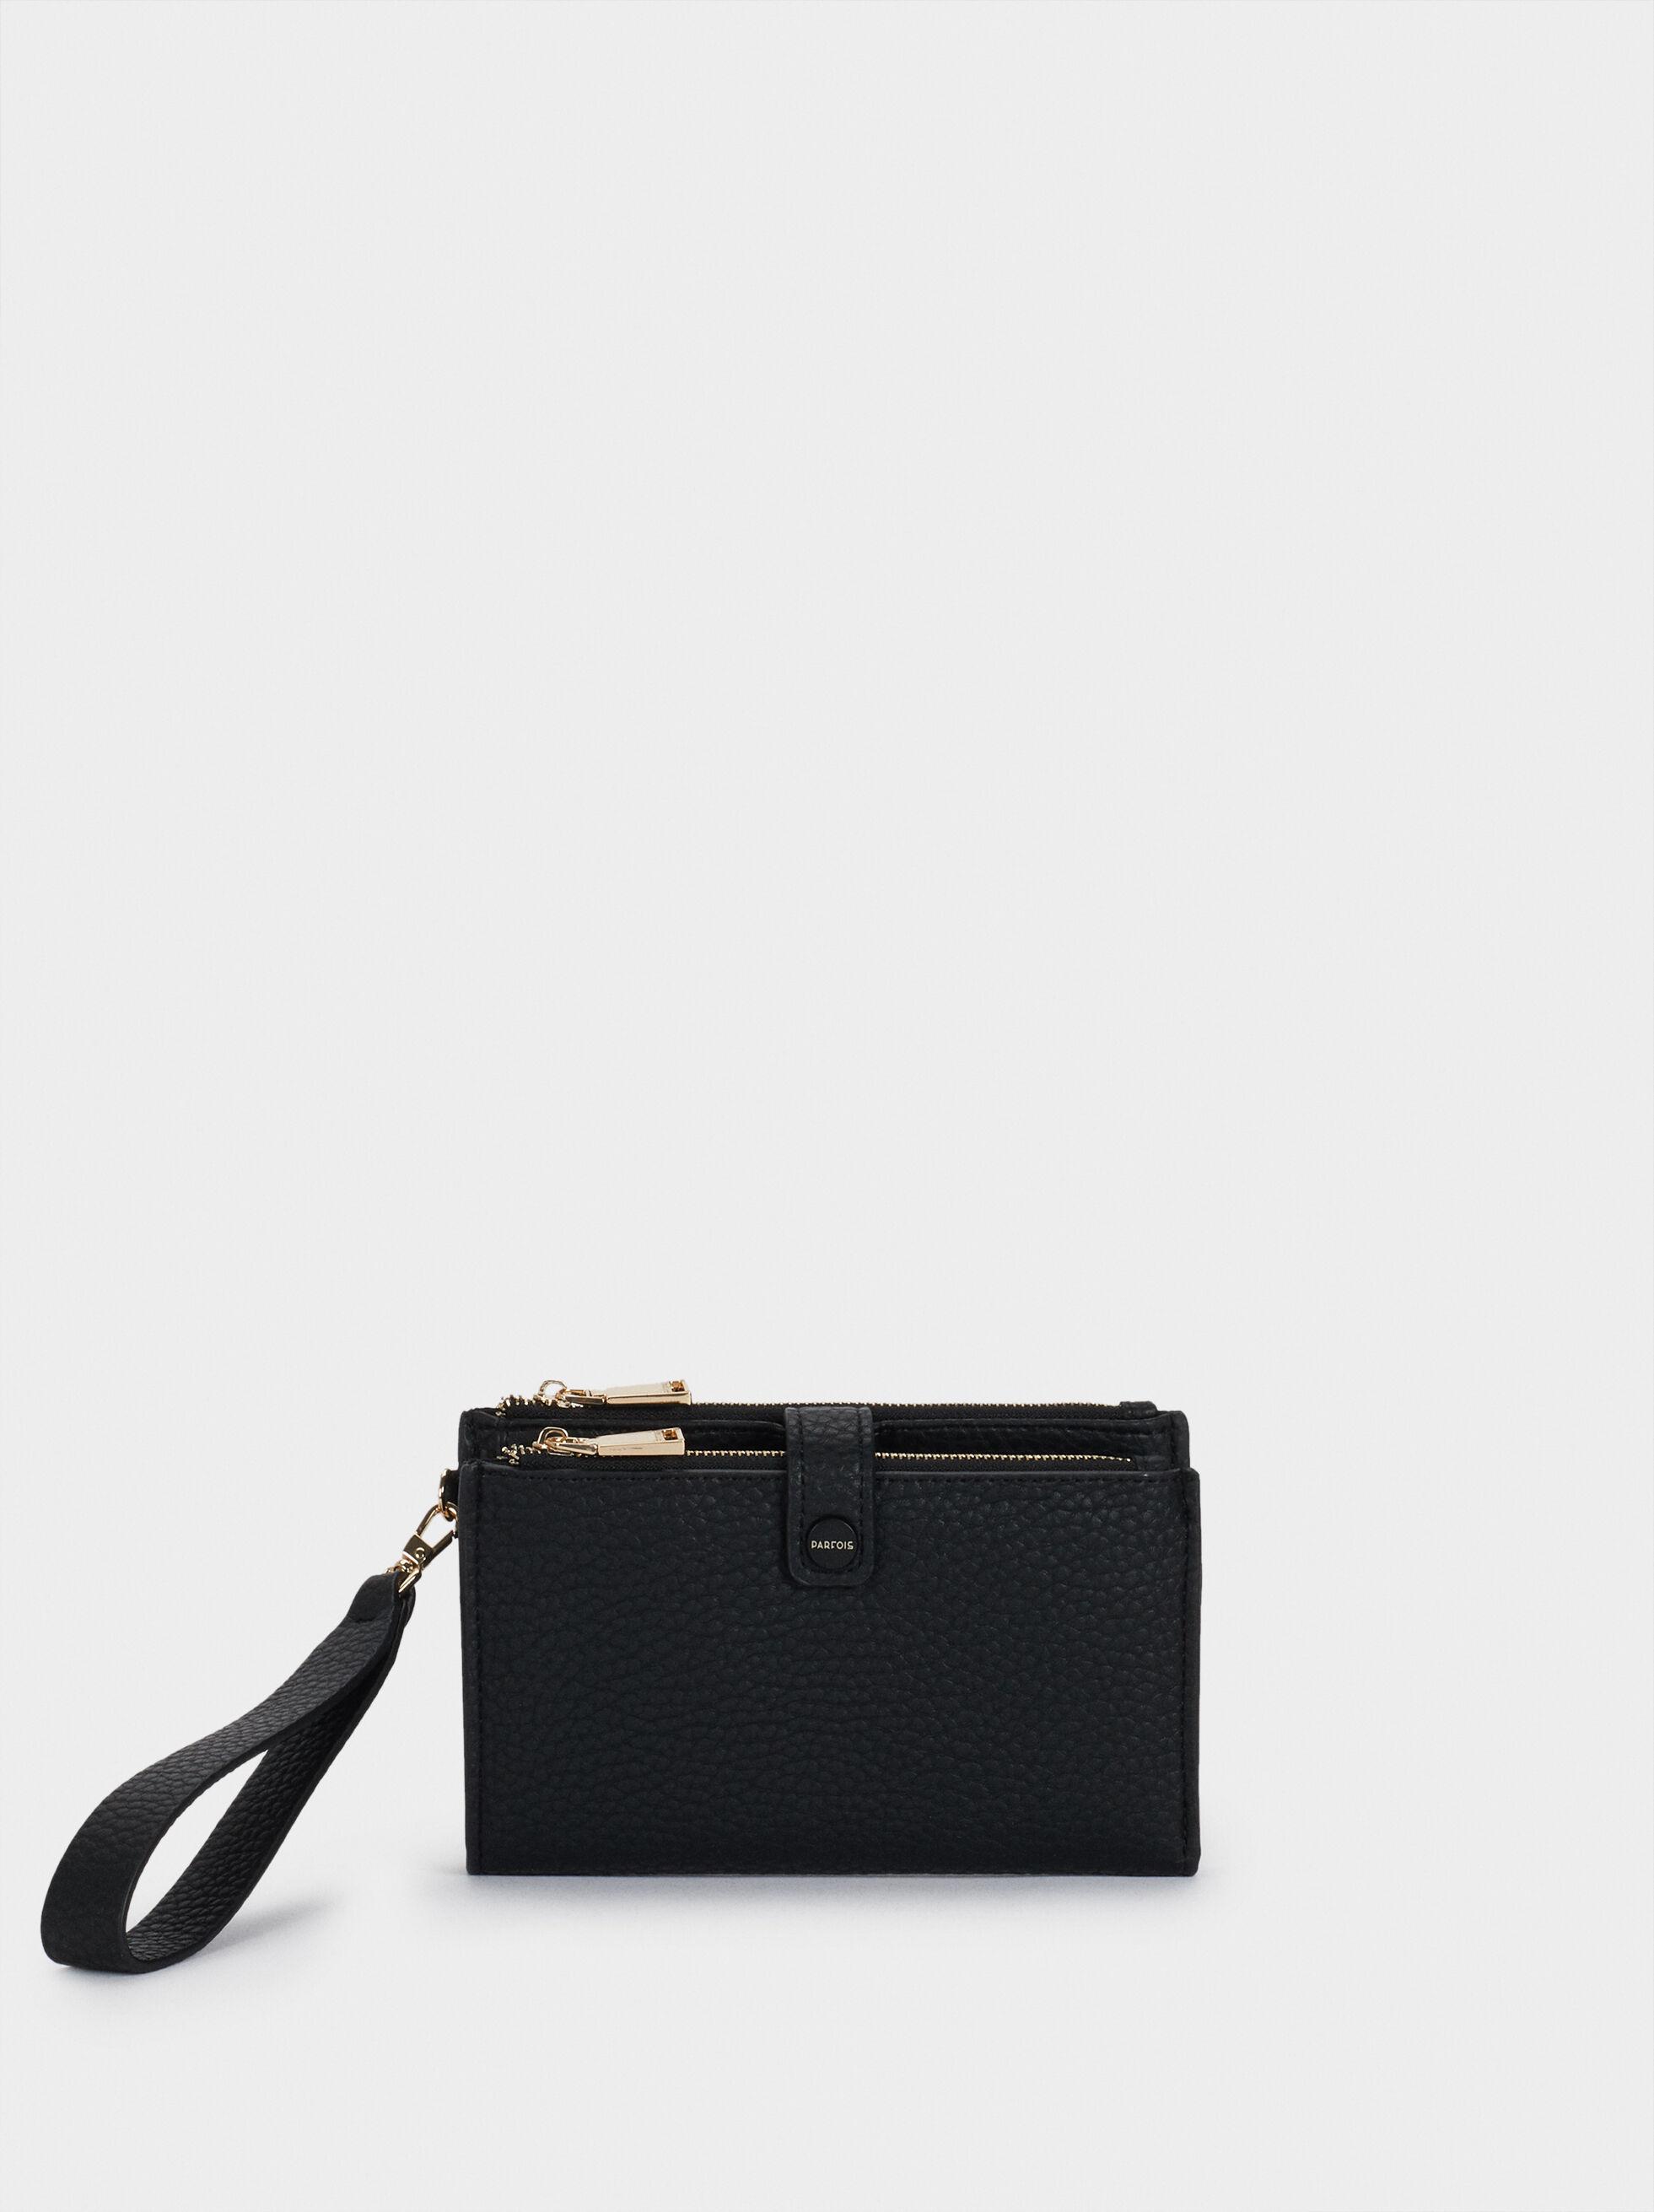 Wallet With Detachable Hand Strap, Black, hi-res